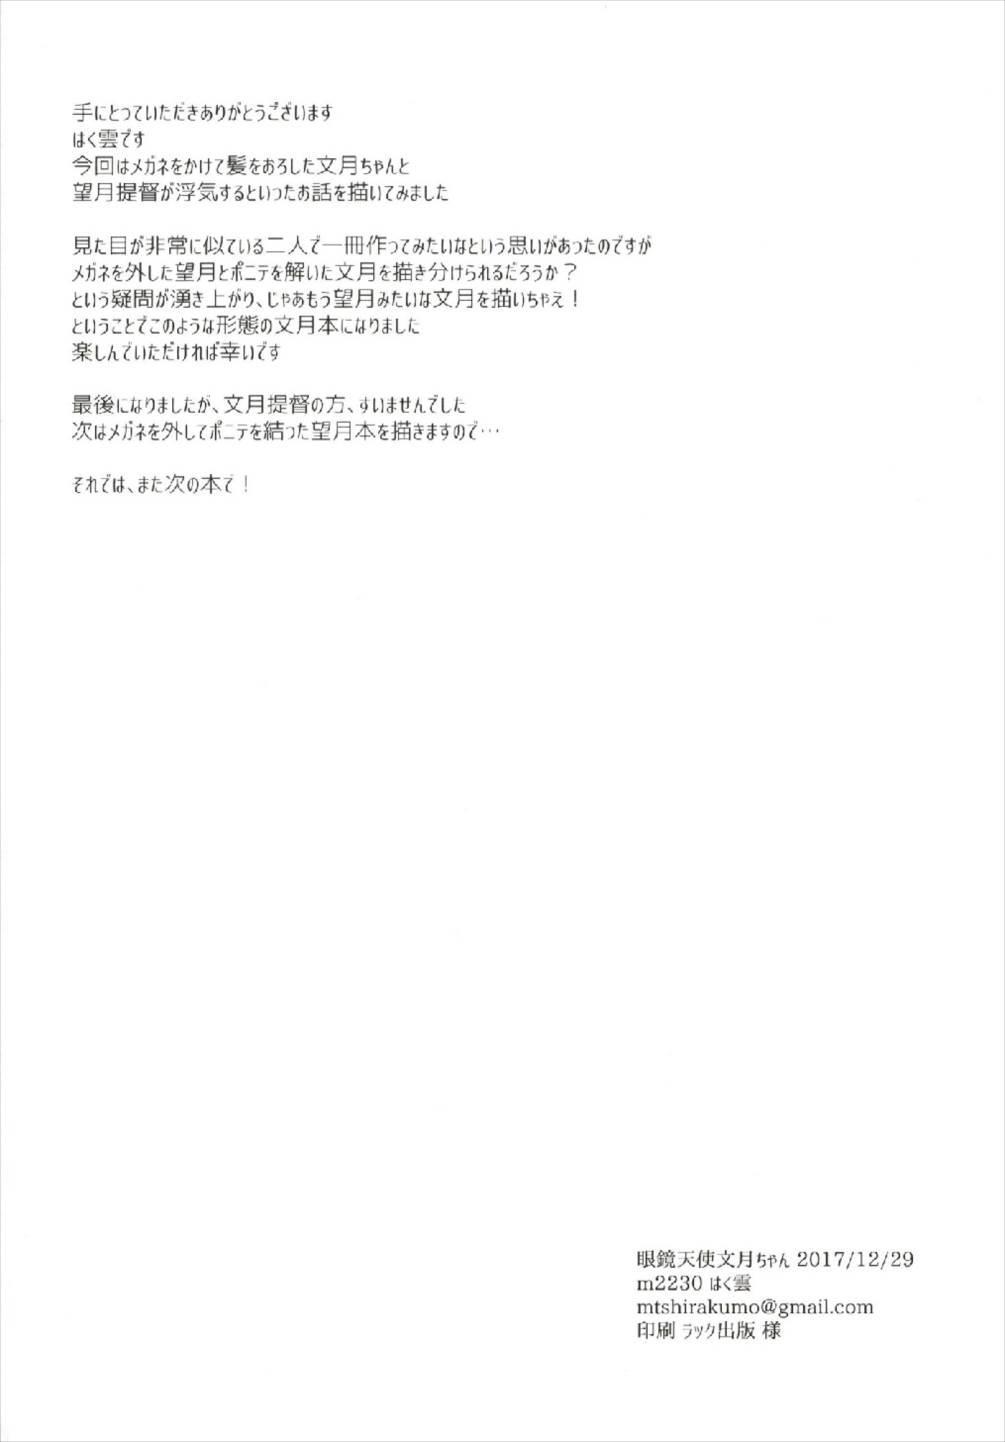 Megane Tenshi Fumizuki-chan 23